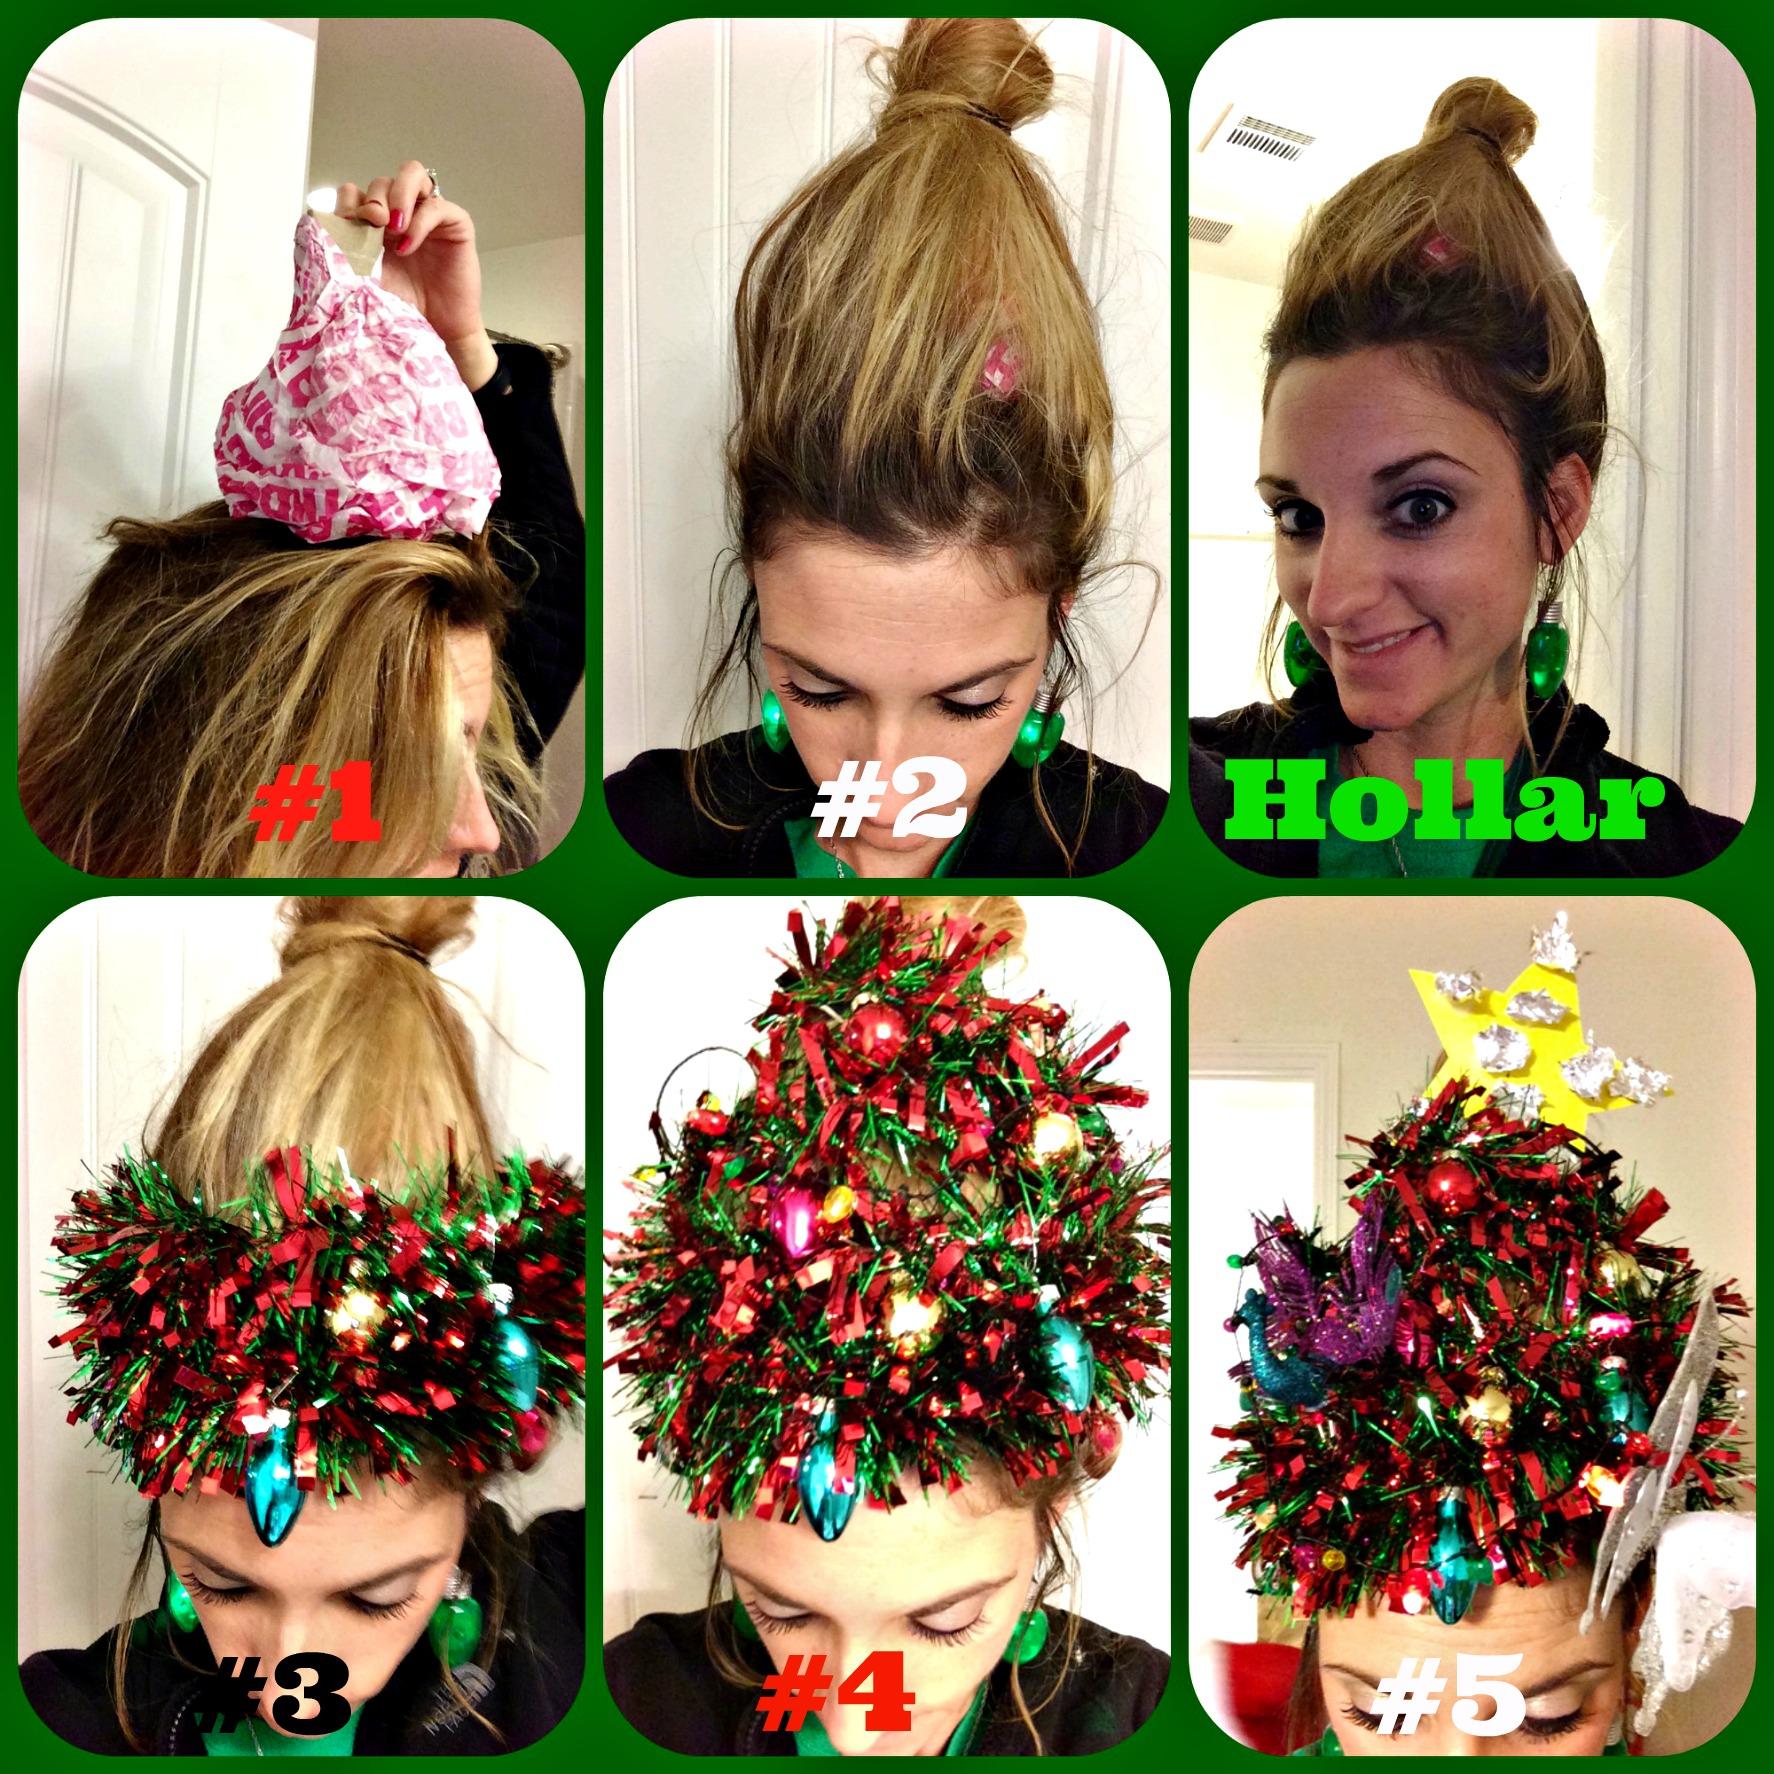 Christmas Hair.How To Do Your Hair Like A Christmas Tree Thecannonball Org